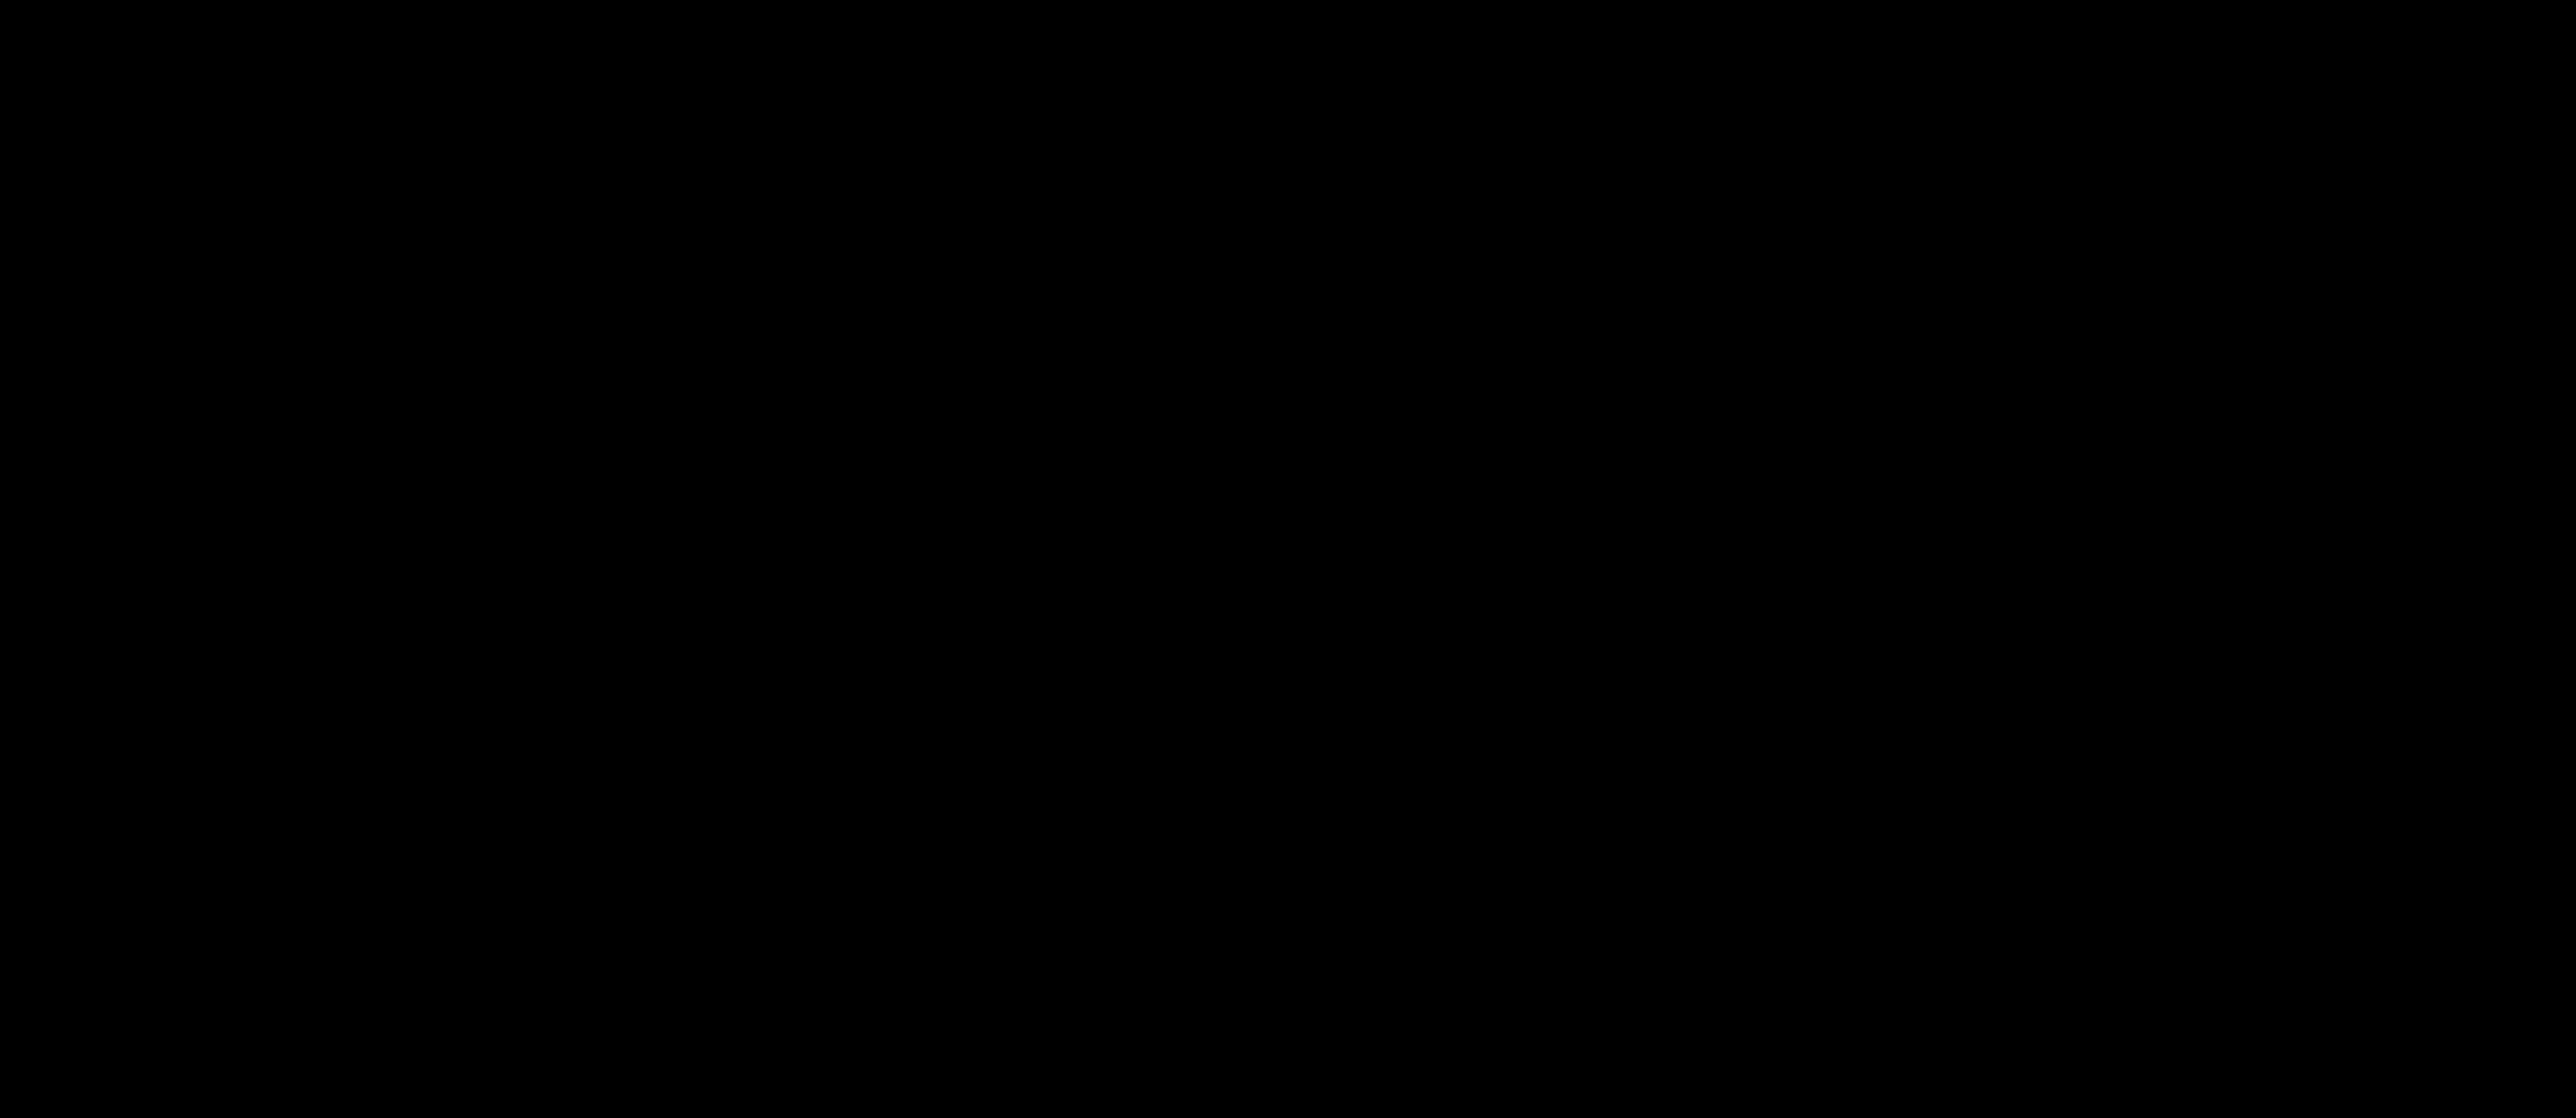 20200205_135643